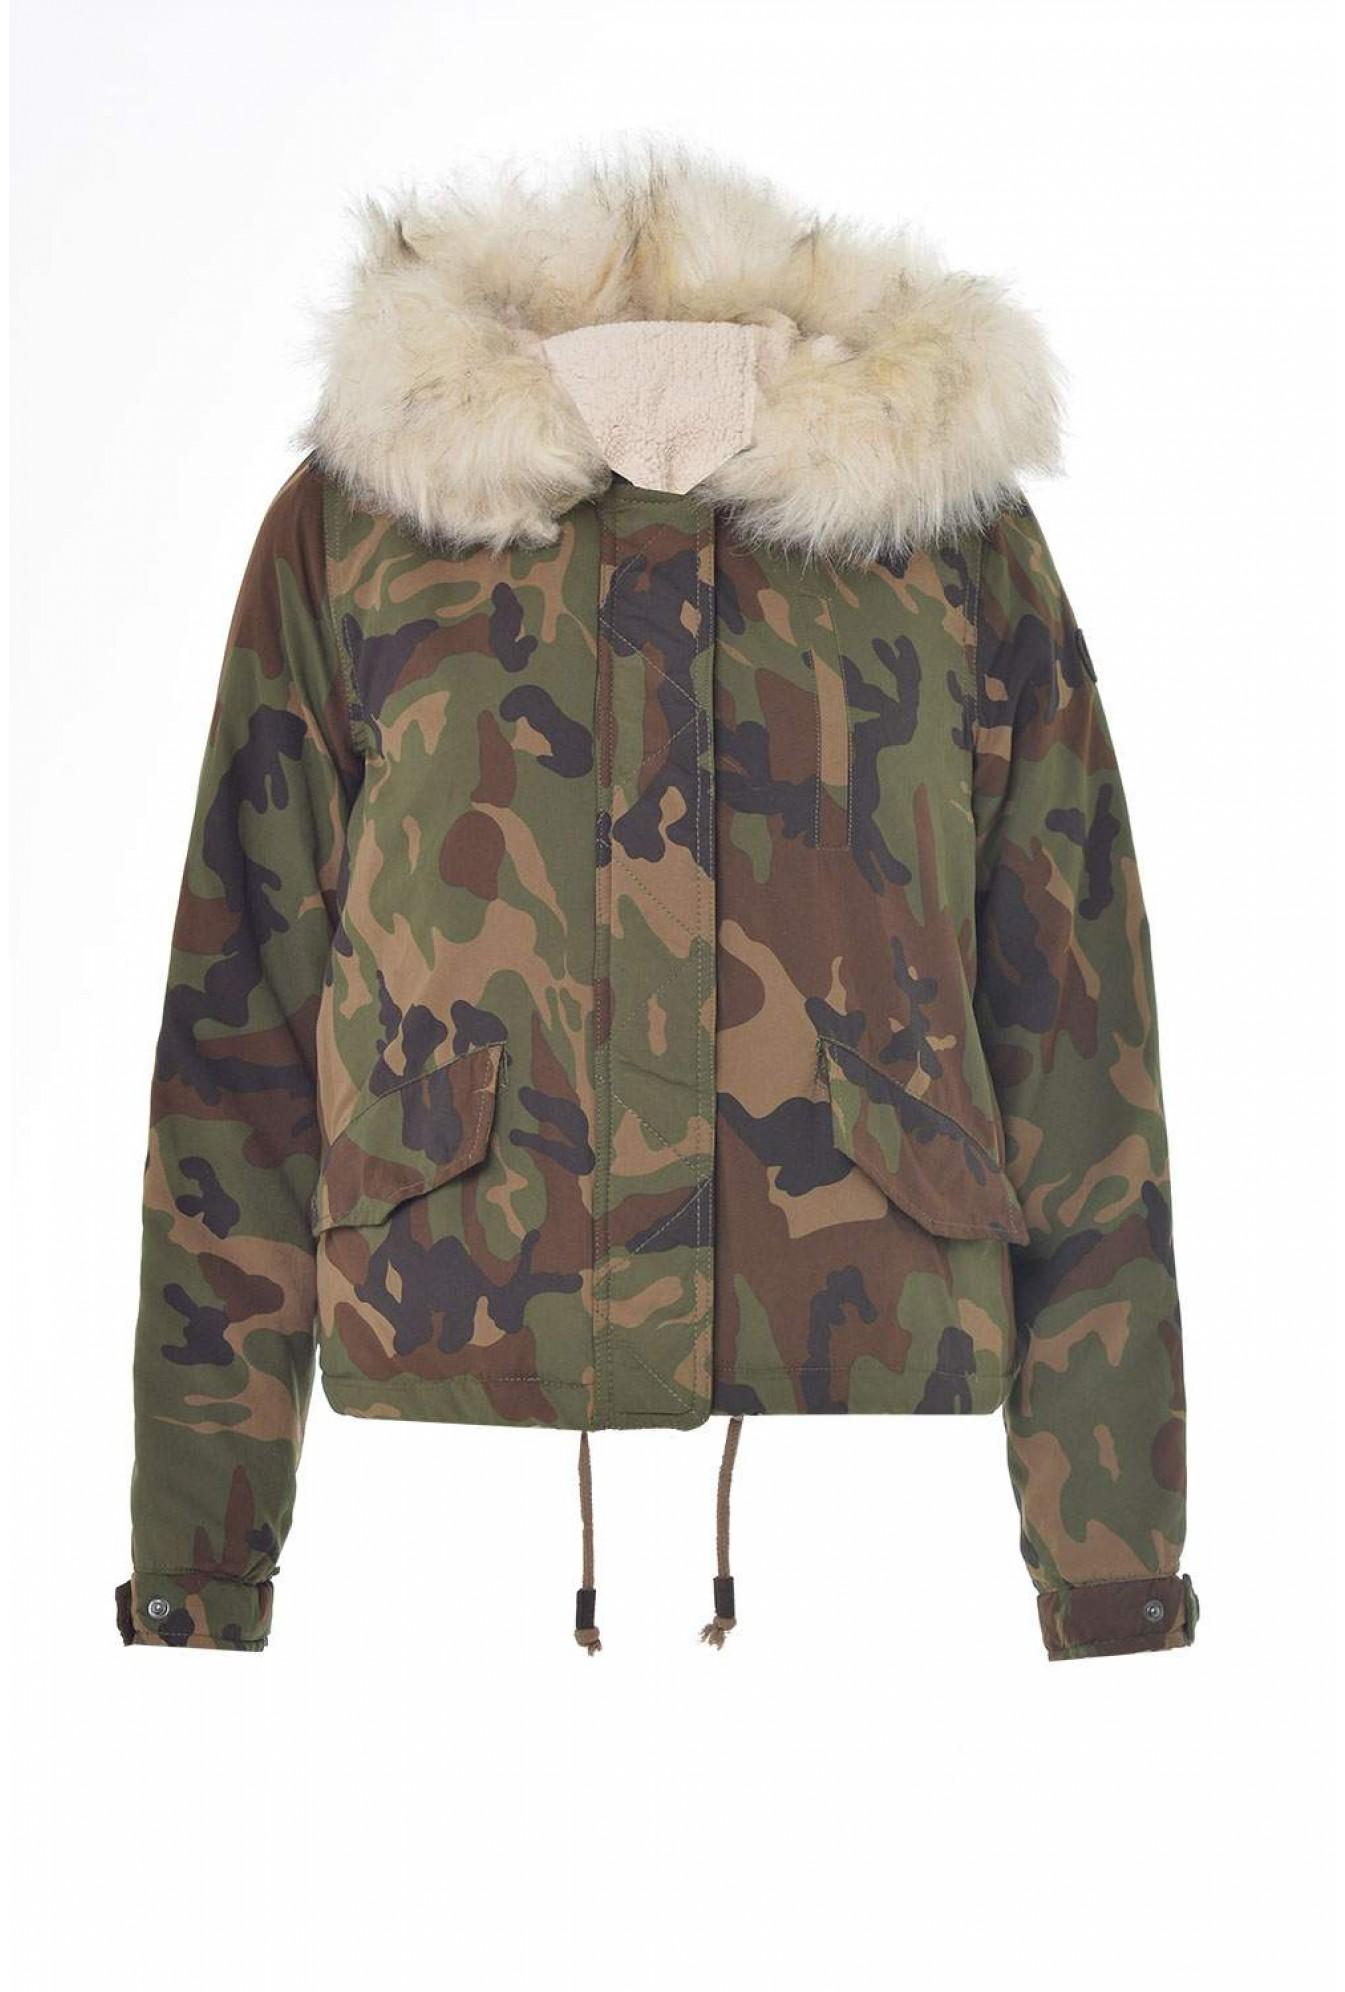 8959bb3bf0234 Only Skylar Short Fur Camo Parka | iCLOTHING